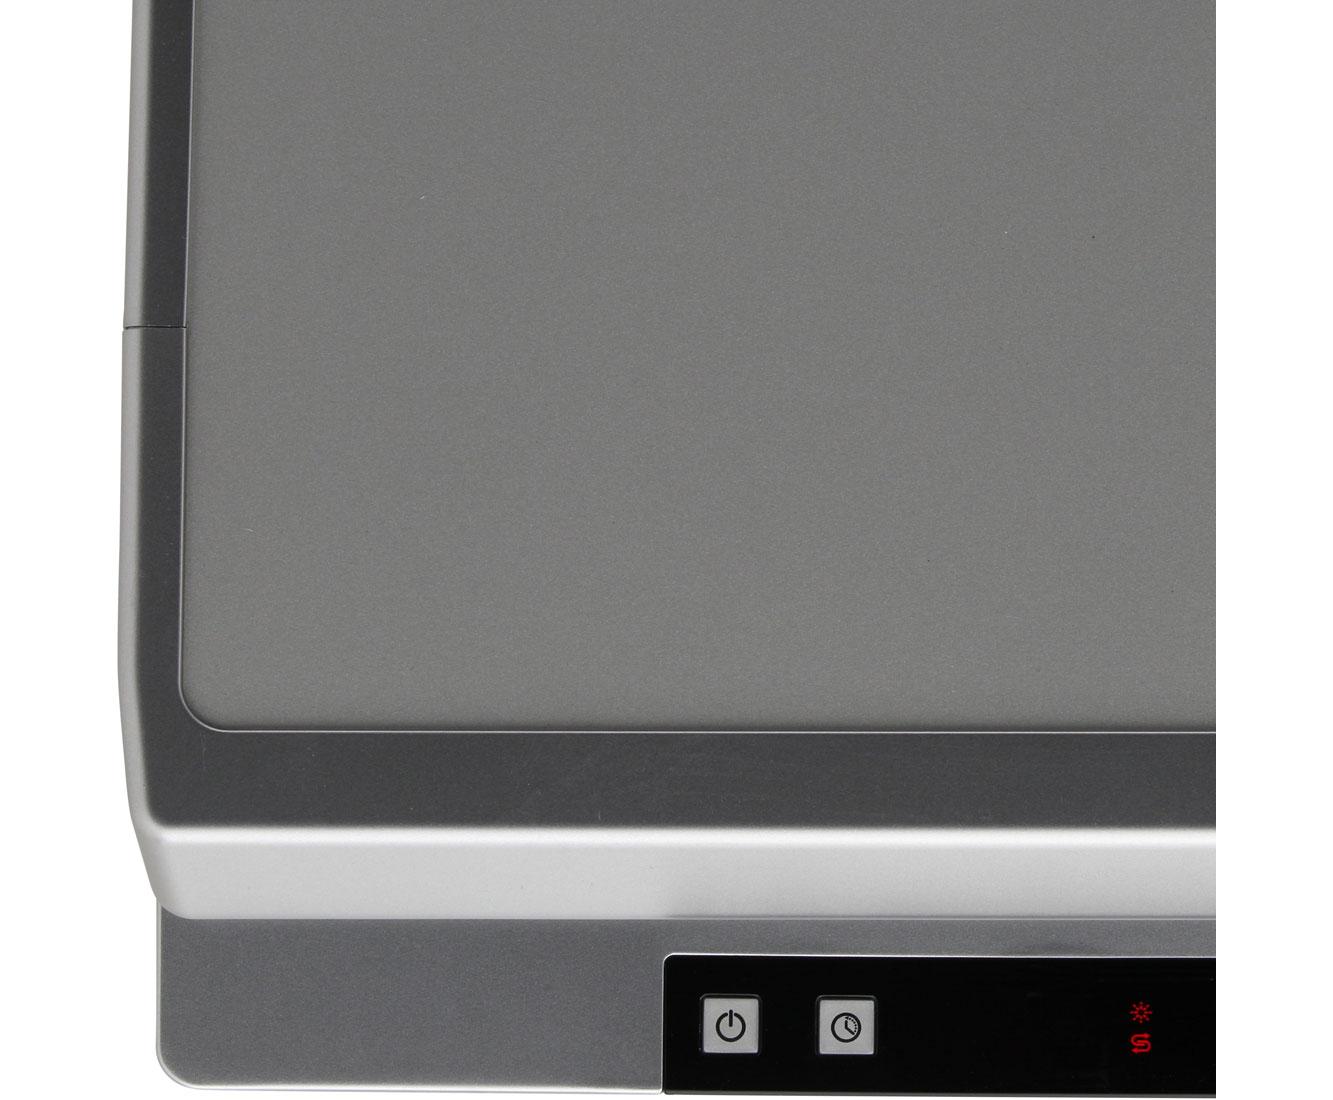 bomann gsp 849 silber geschirrsp ler freistehend 45cm silber neu ebay. Black Bedroom Furniture Sets. Home Design Ideas